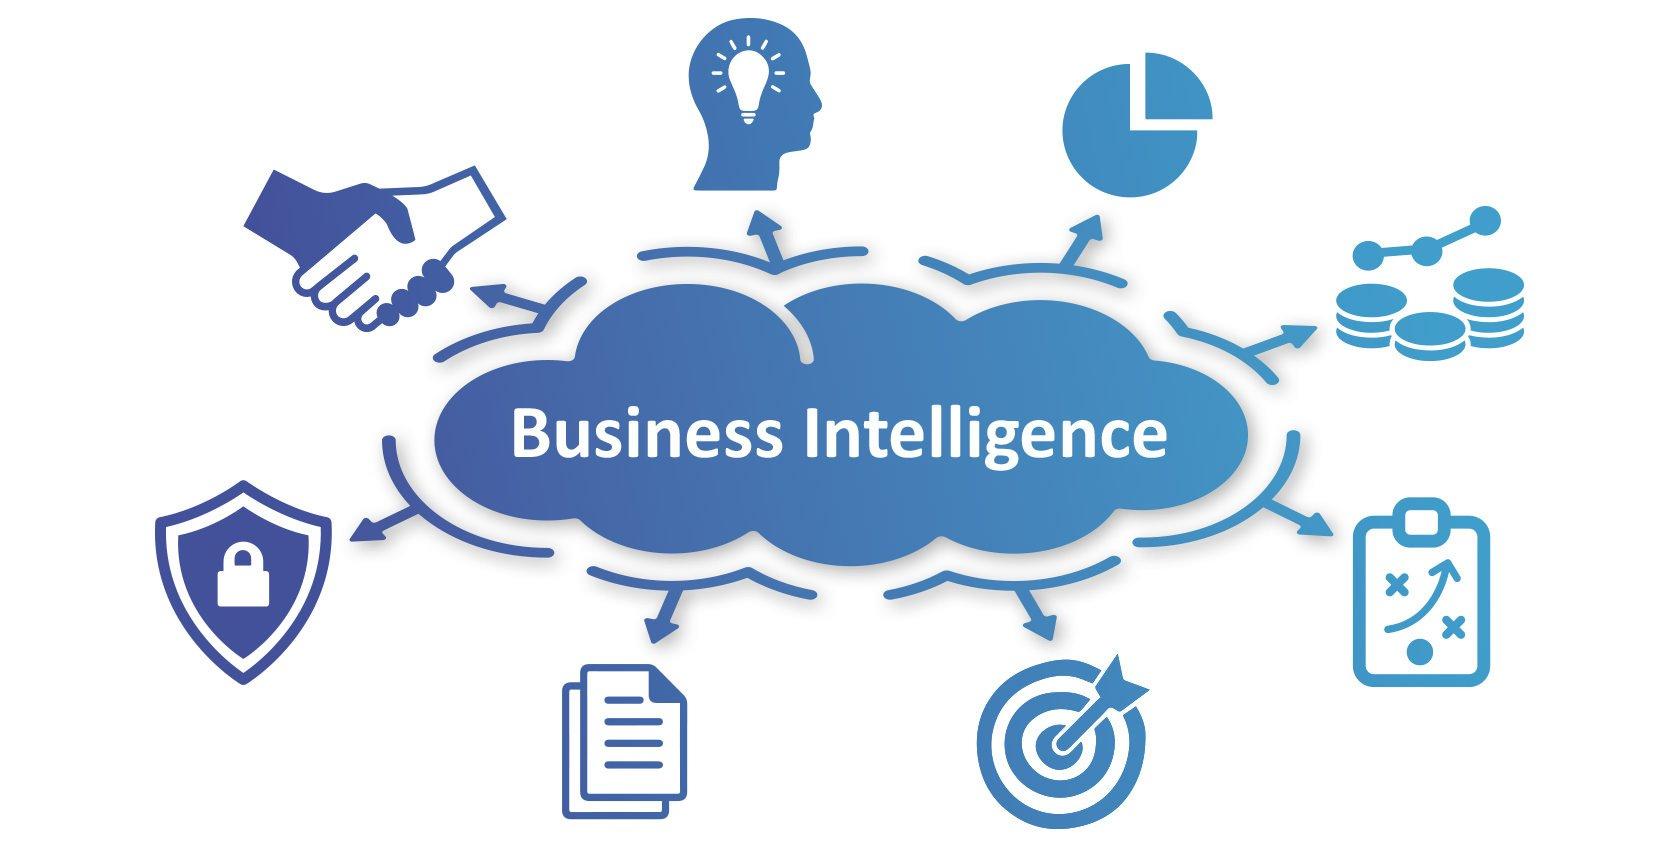 csm_business-intelligence_b137e16154.jpg